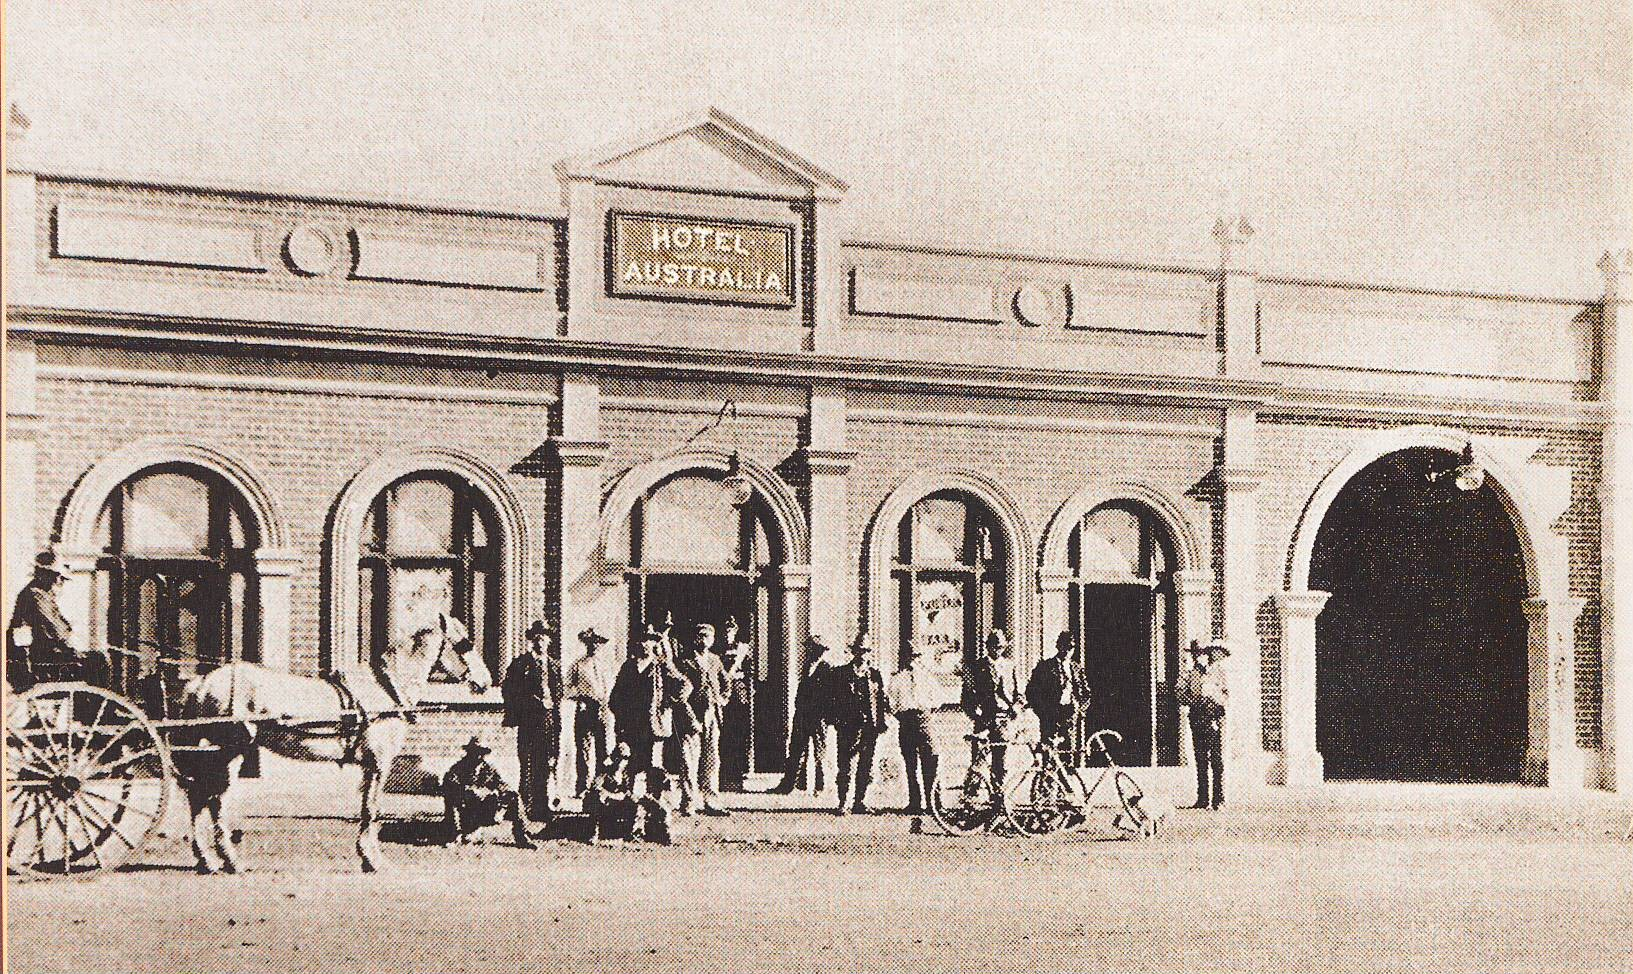 The Hotel Australia – The Coach House, Laverton